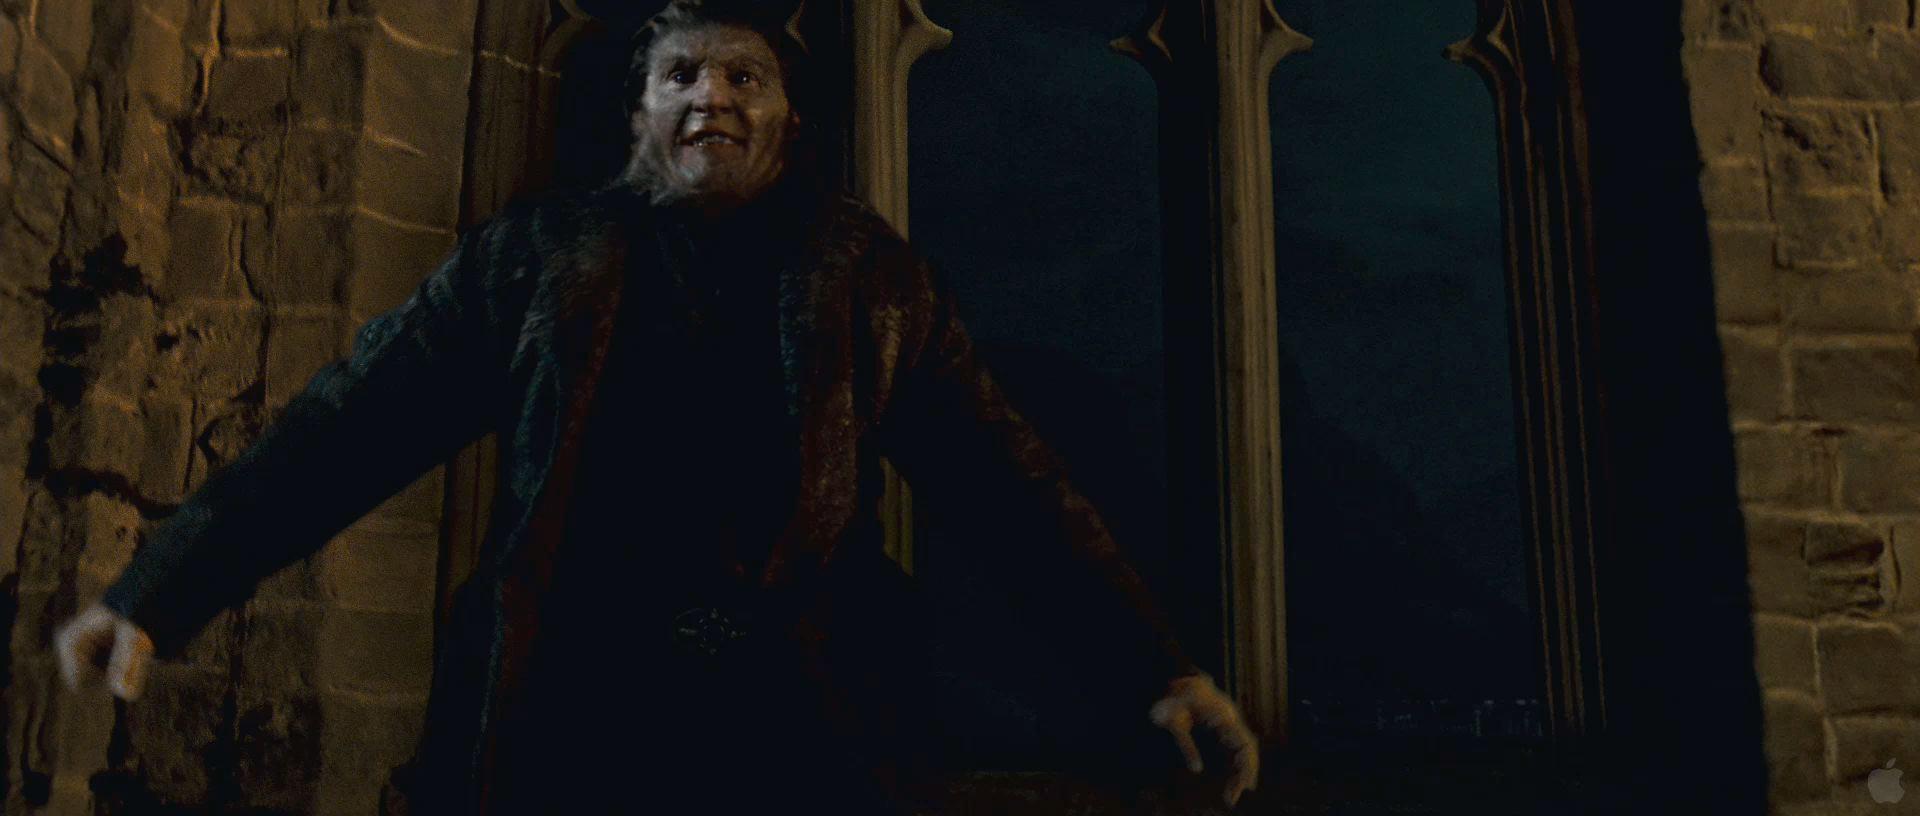 Harry Potter BlogHogwarts HP7 2 Trailer 10